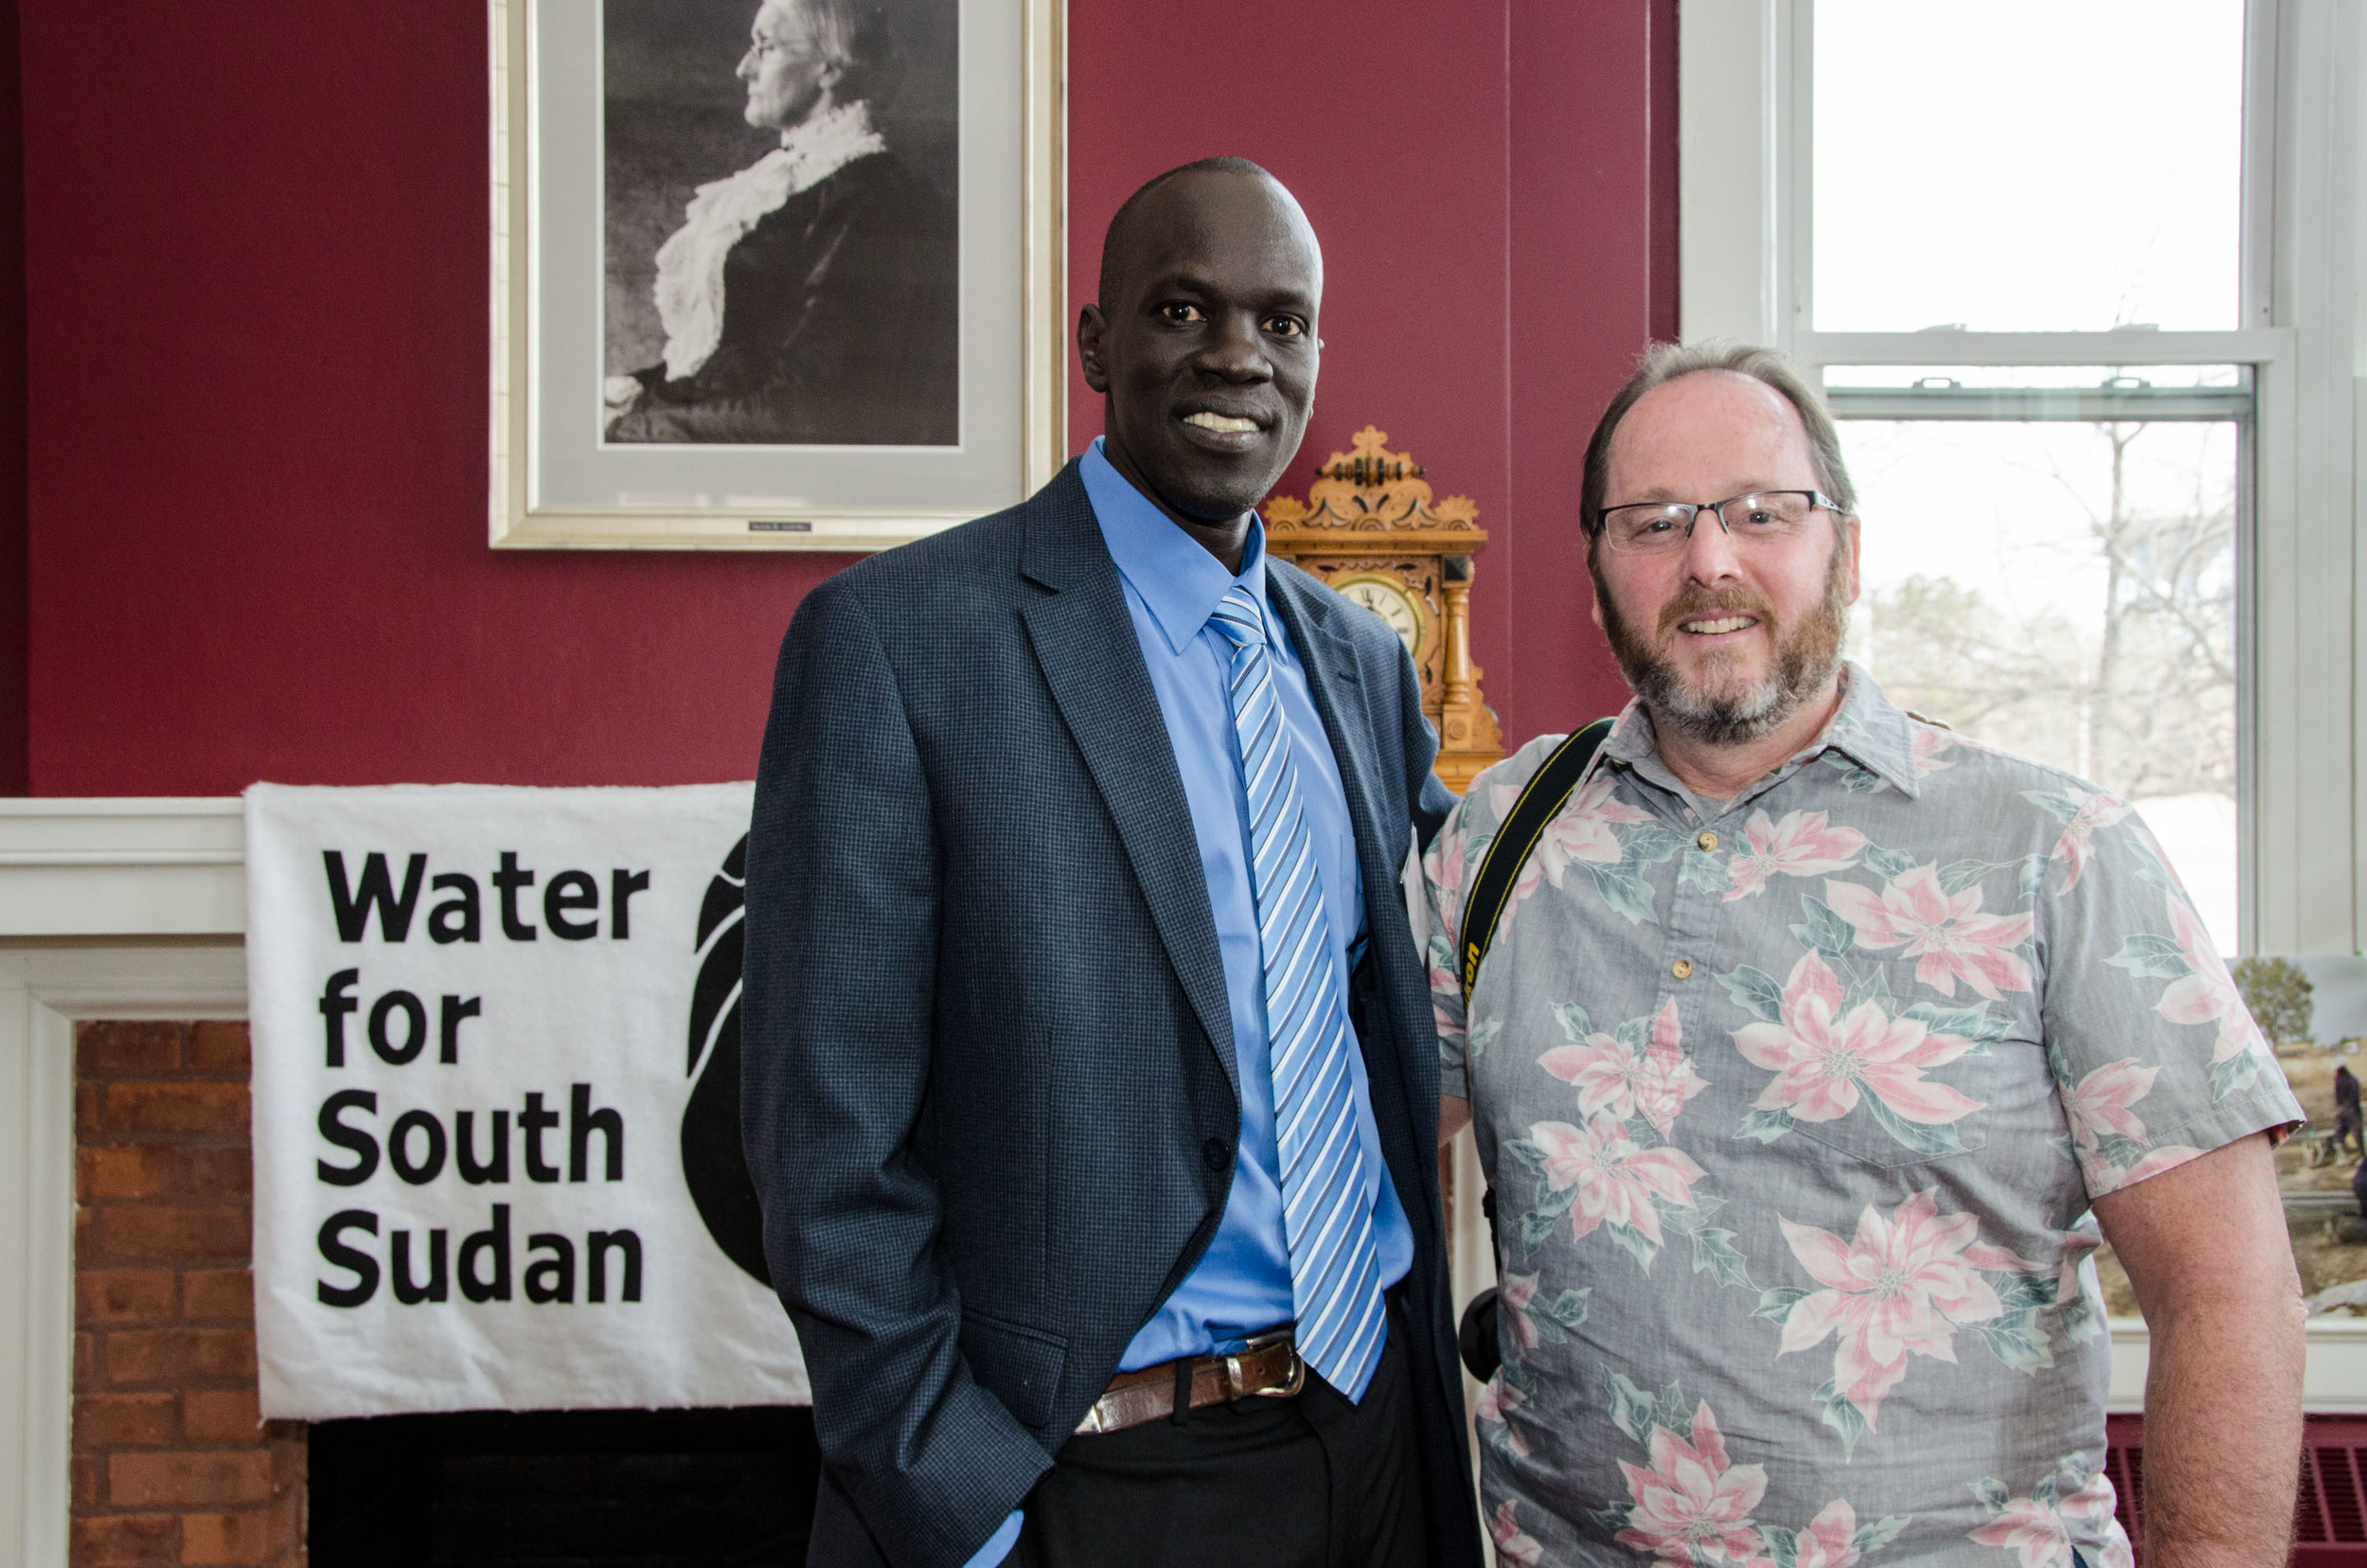 20160322-Water for South Sudan Press Conf-135.jpg